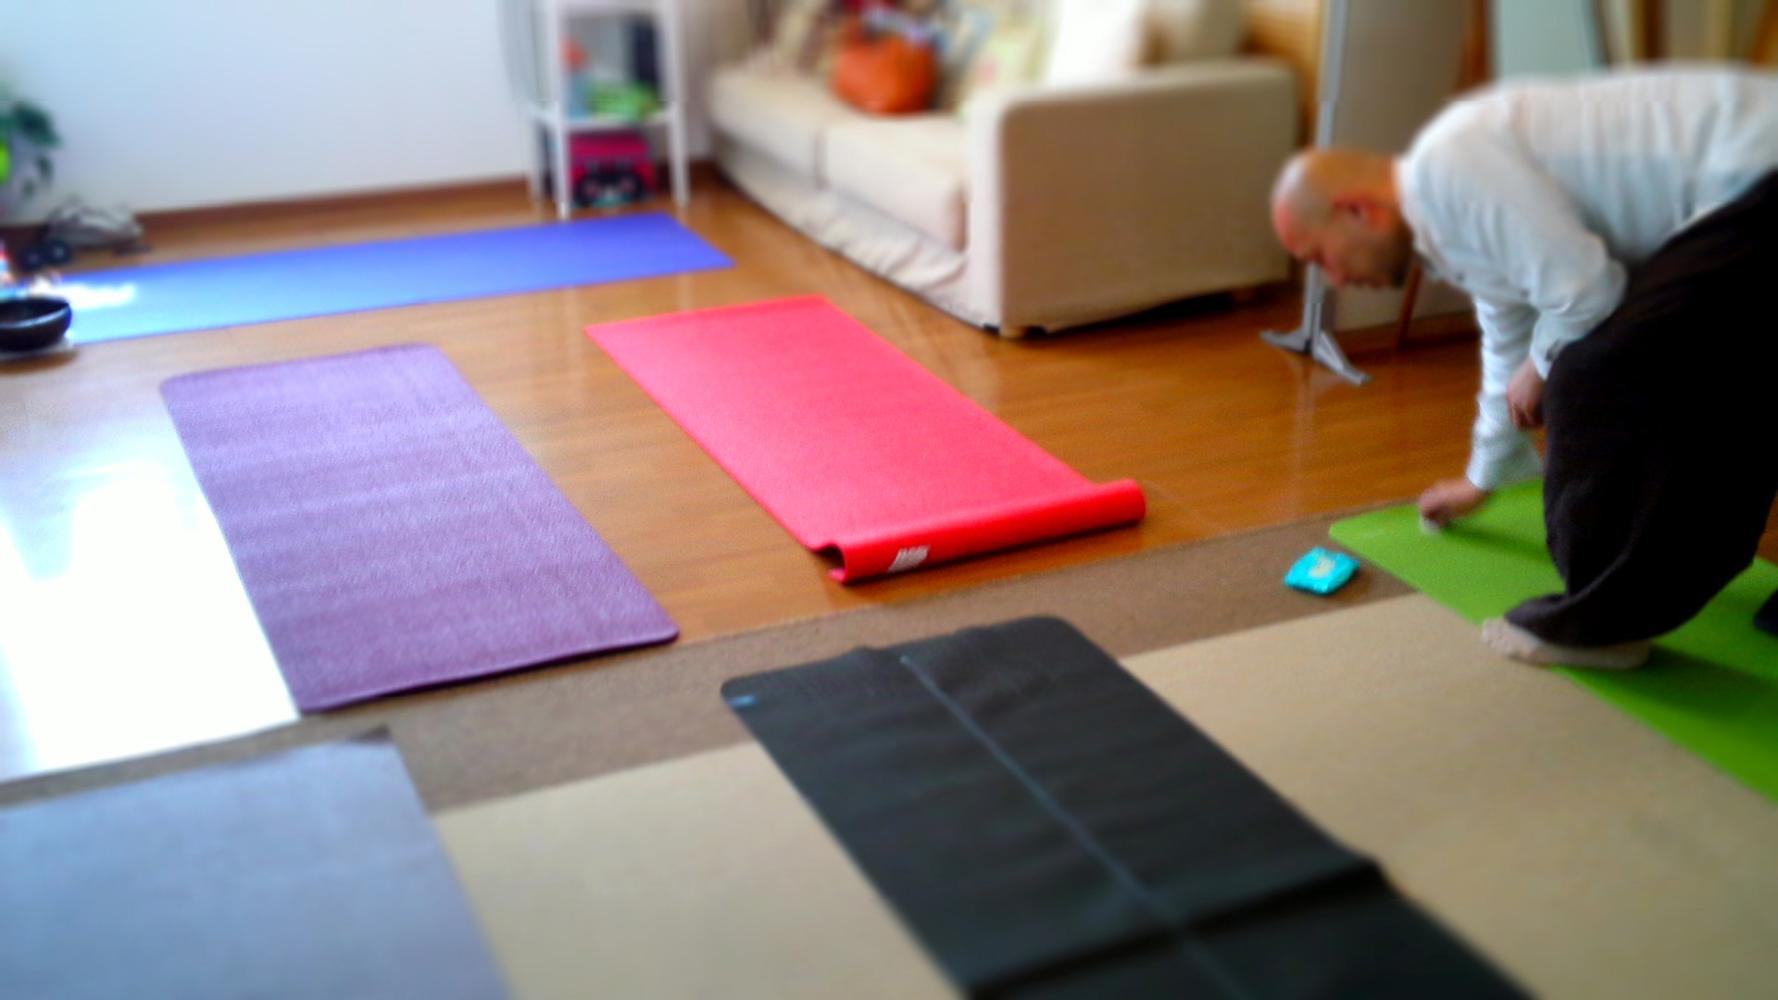 karen_yoga04.jpg